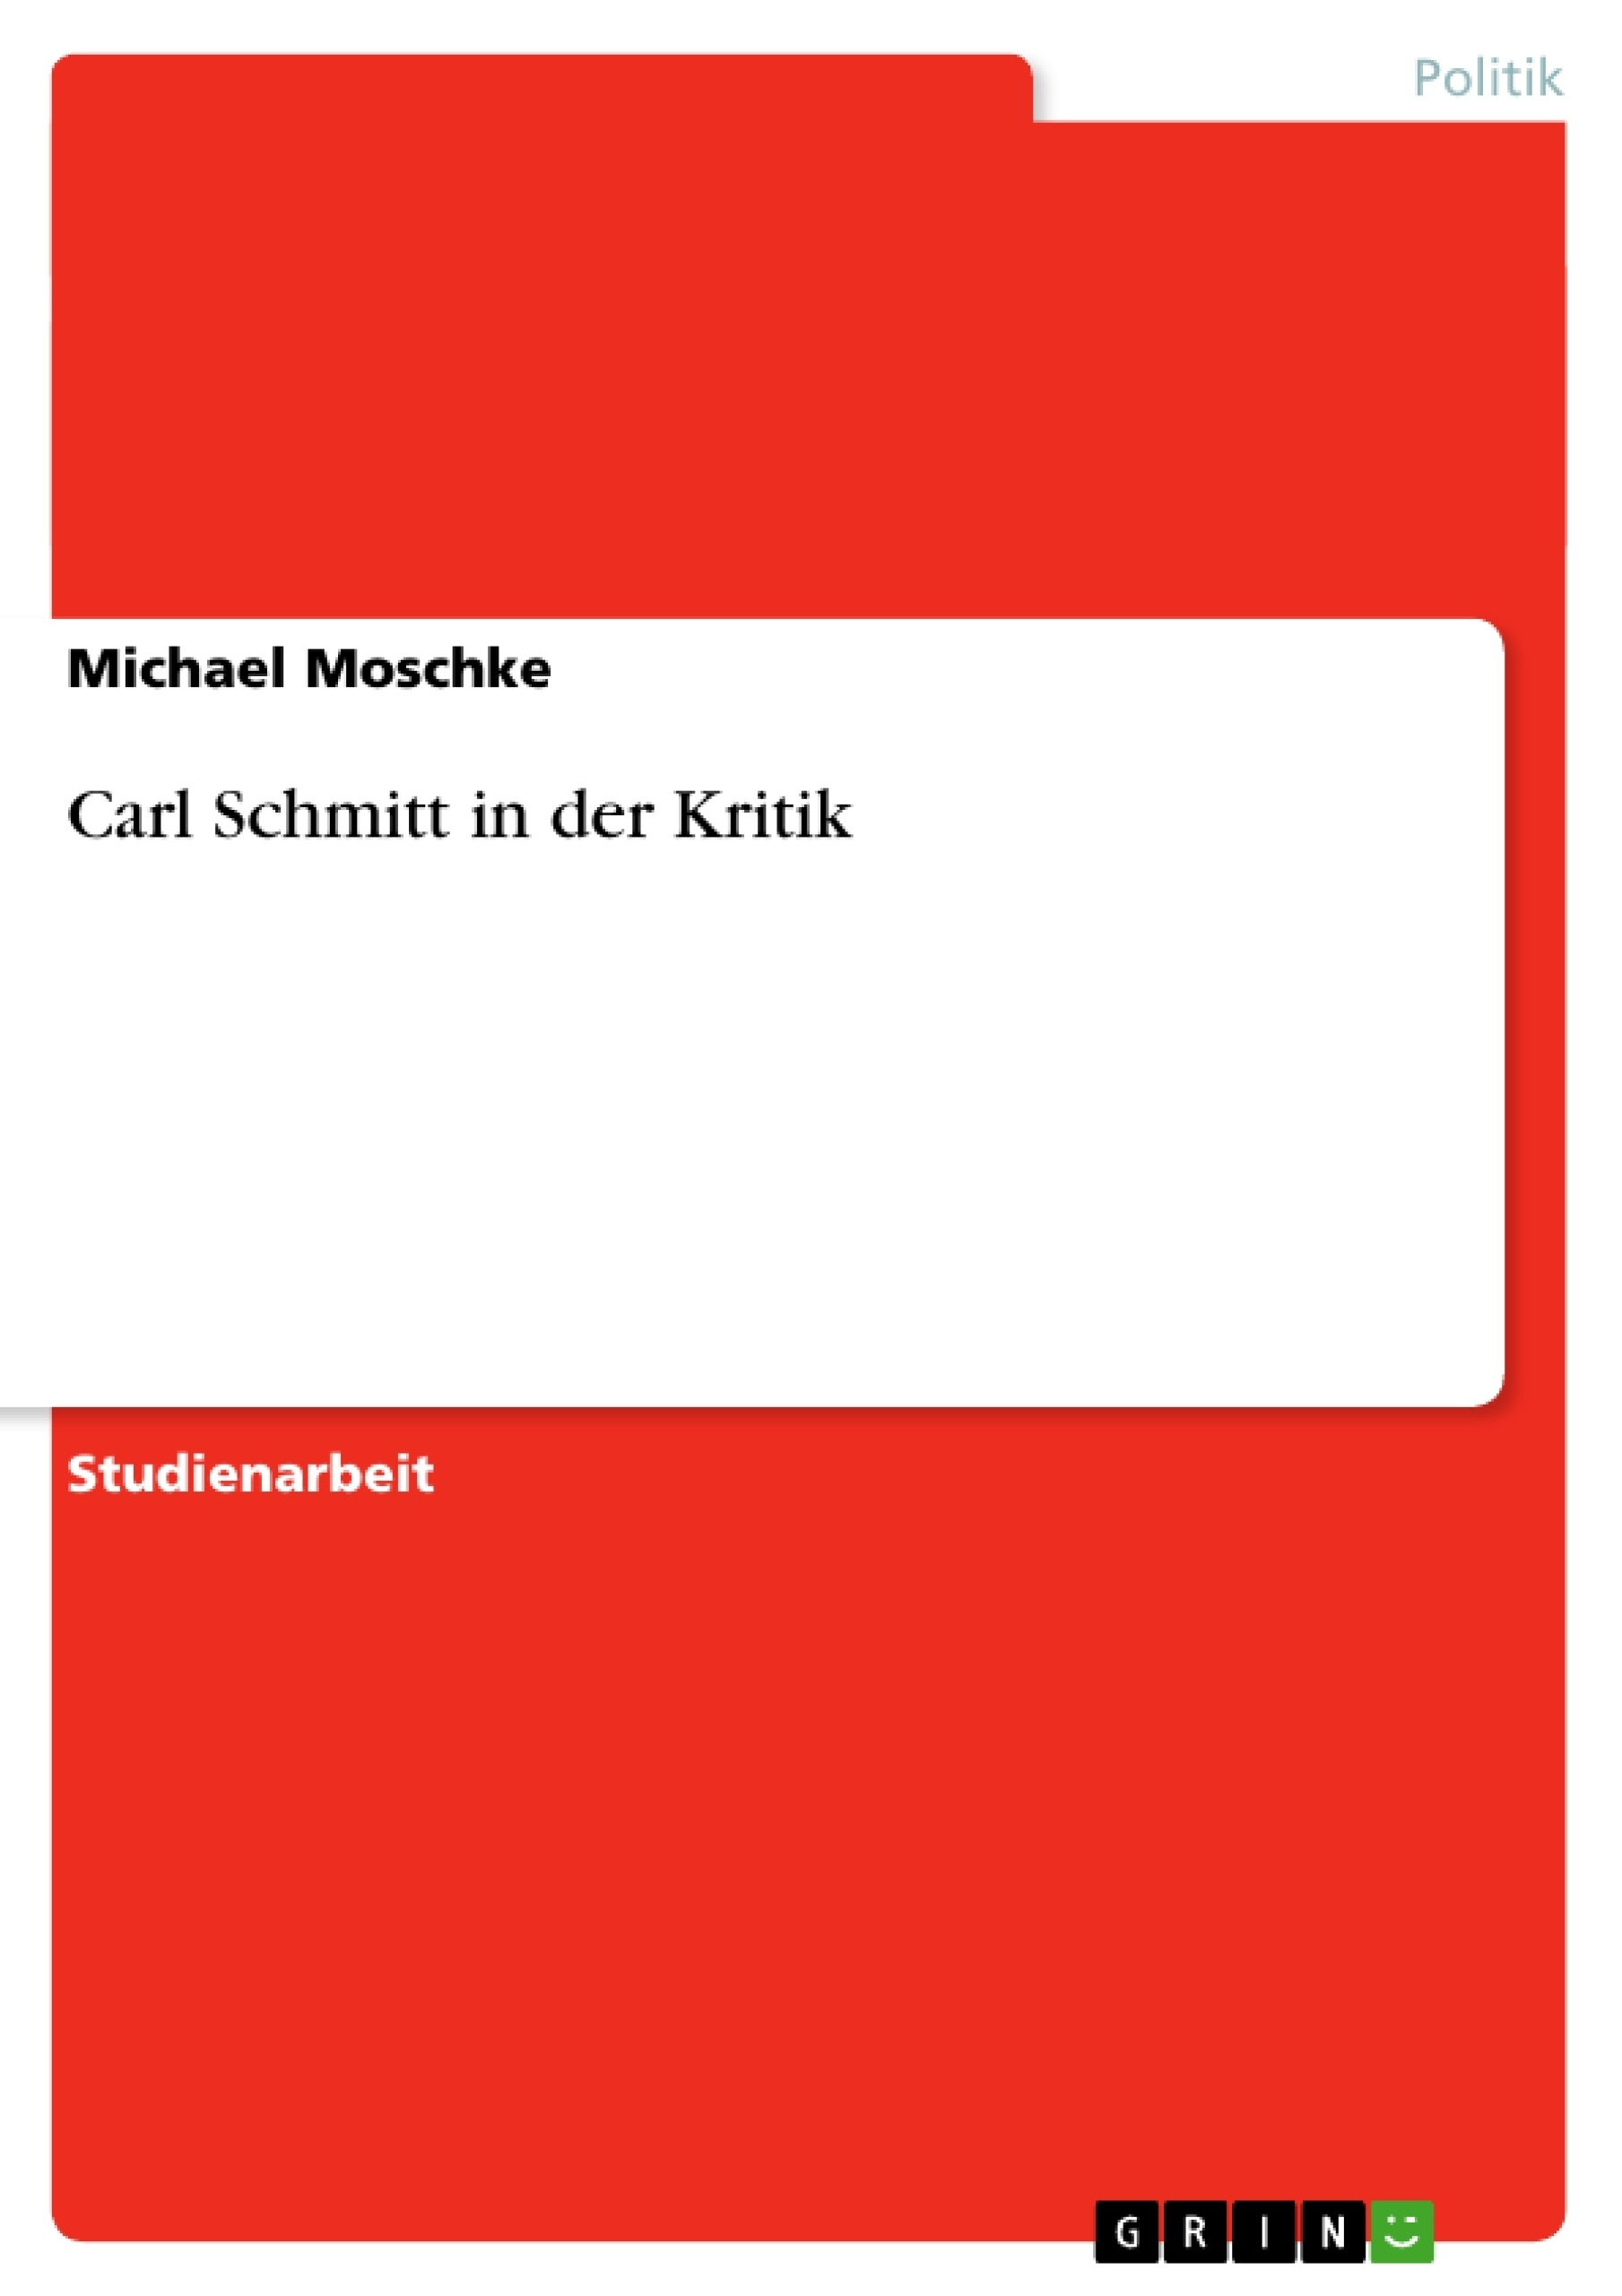 Titel: Carl Schmitt in der Kritik